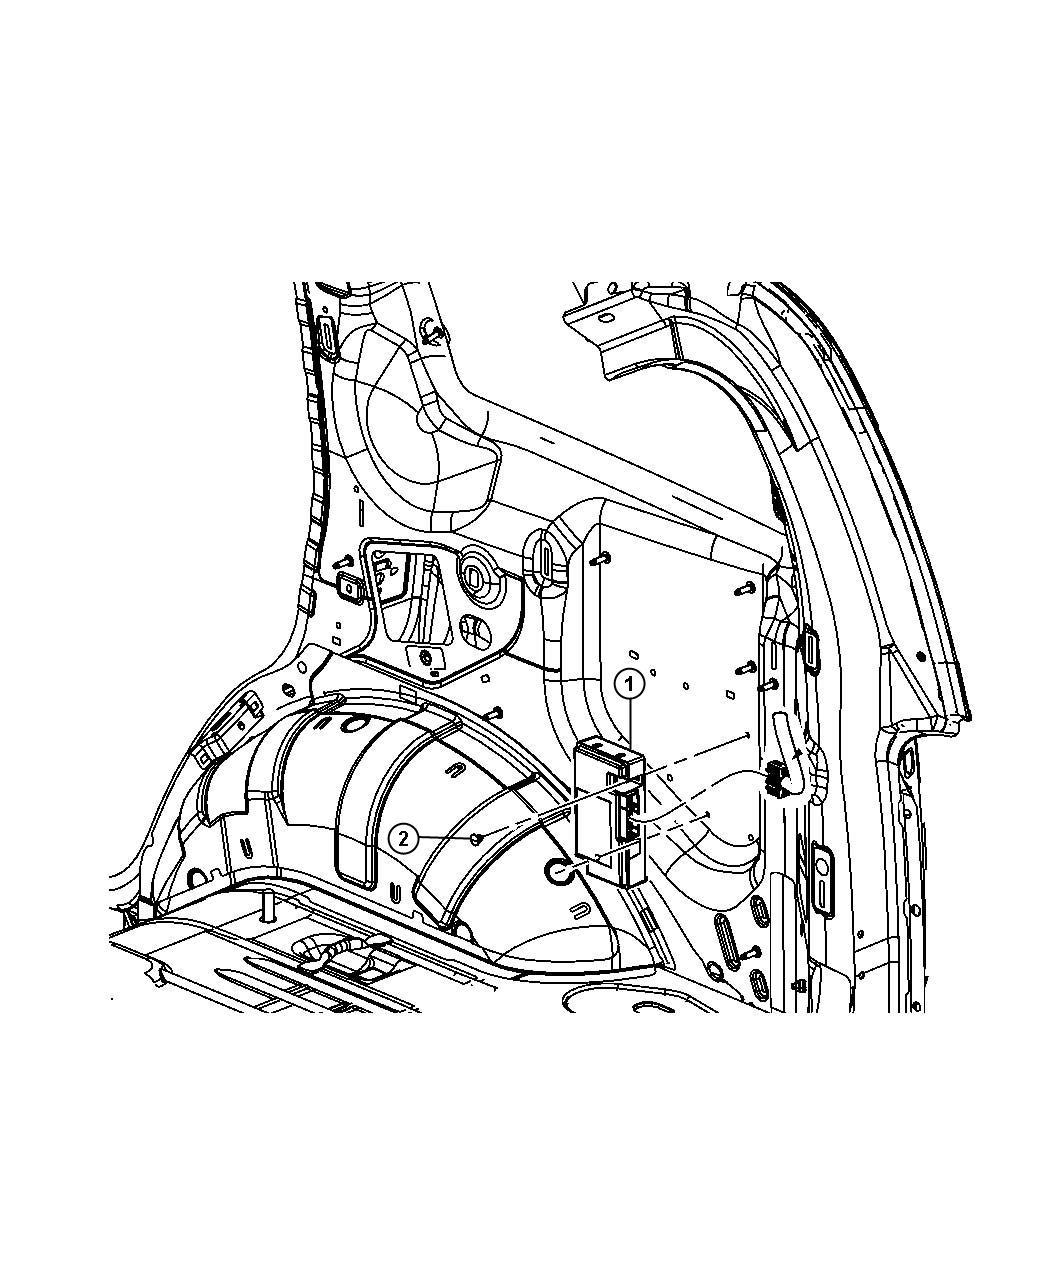 Dodge Charger Module Telematics Hfm Those